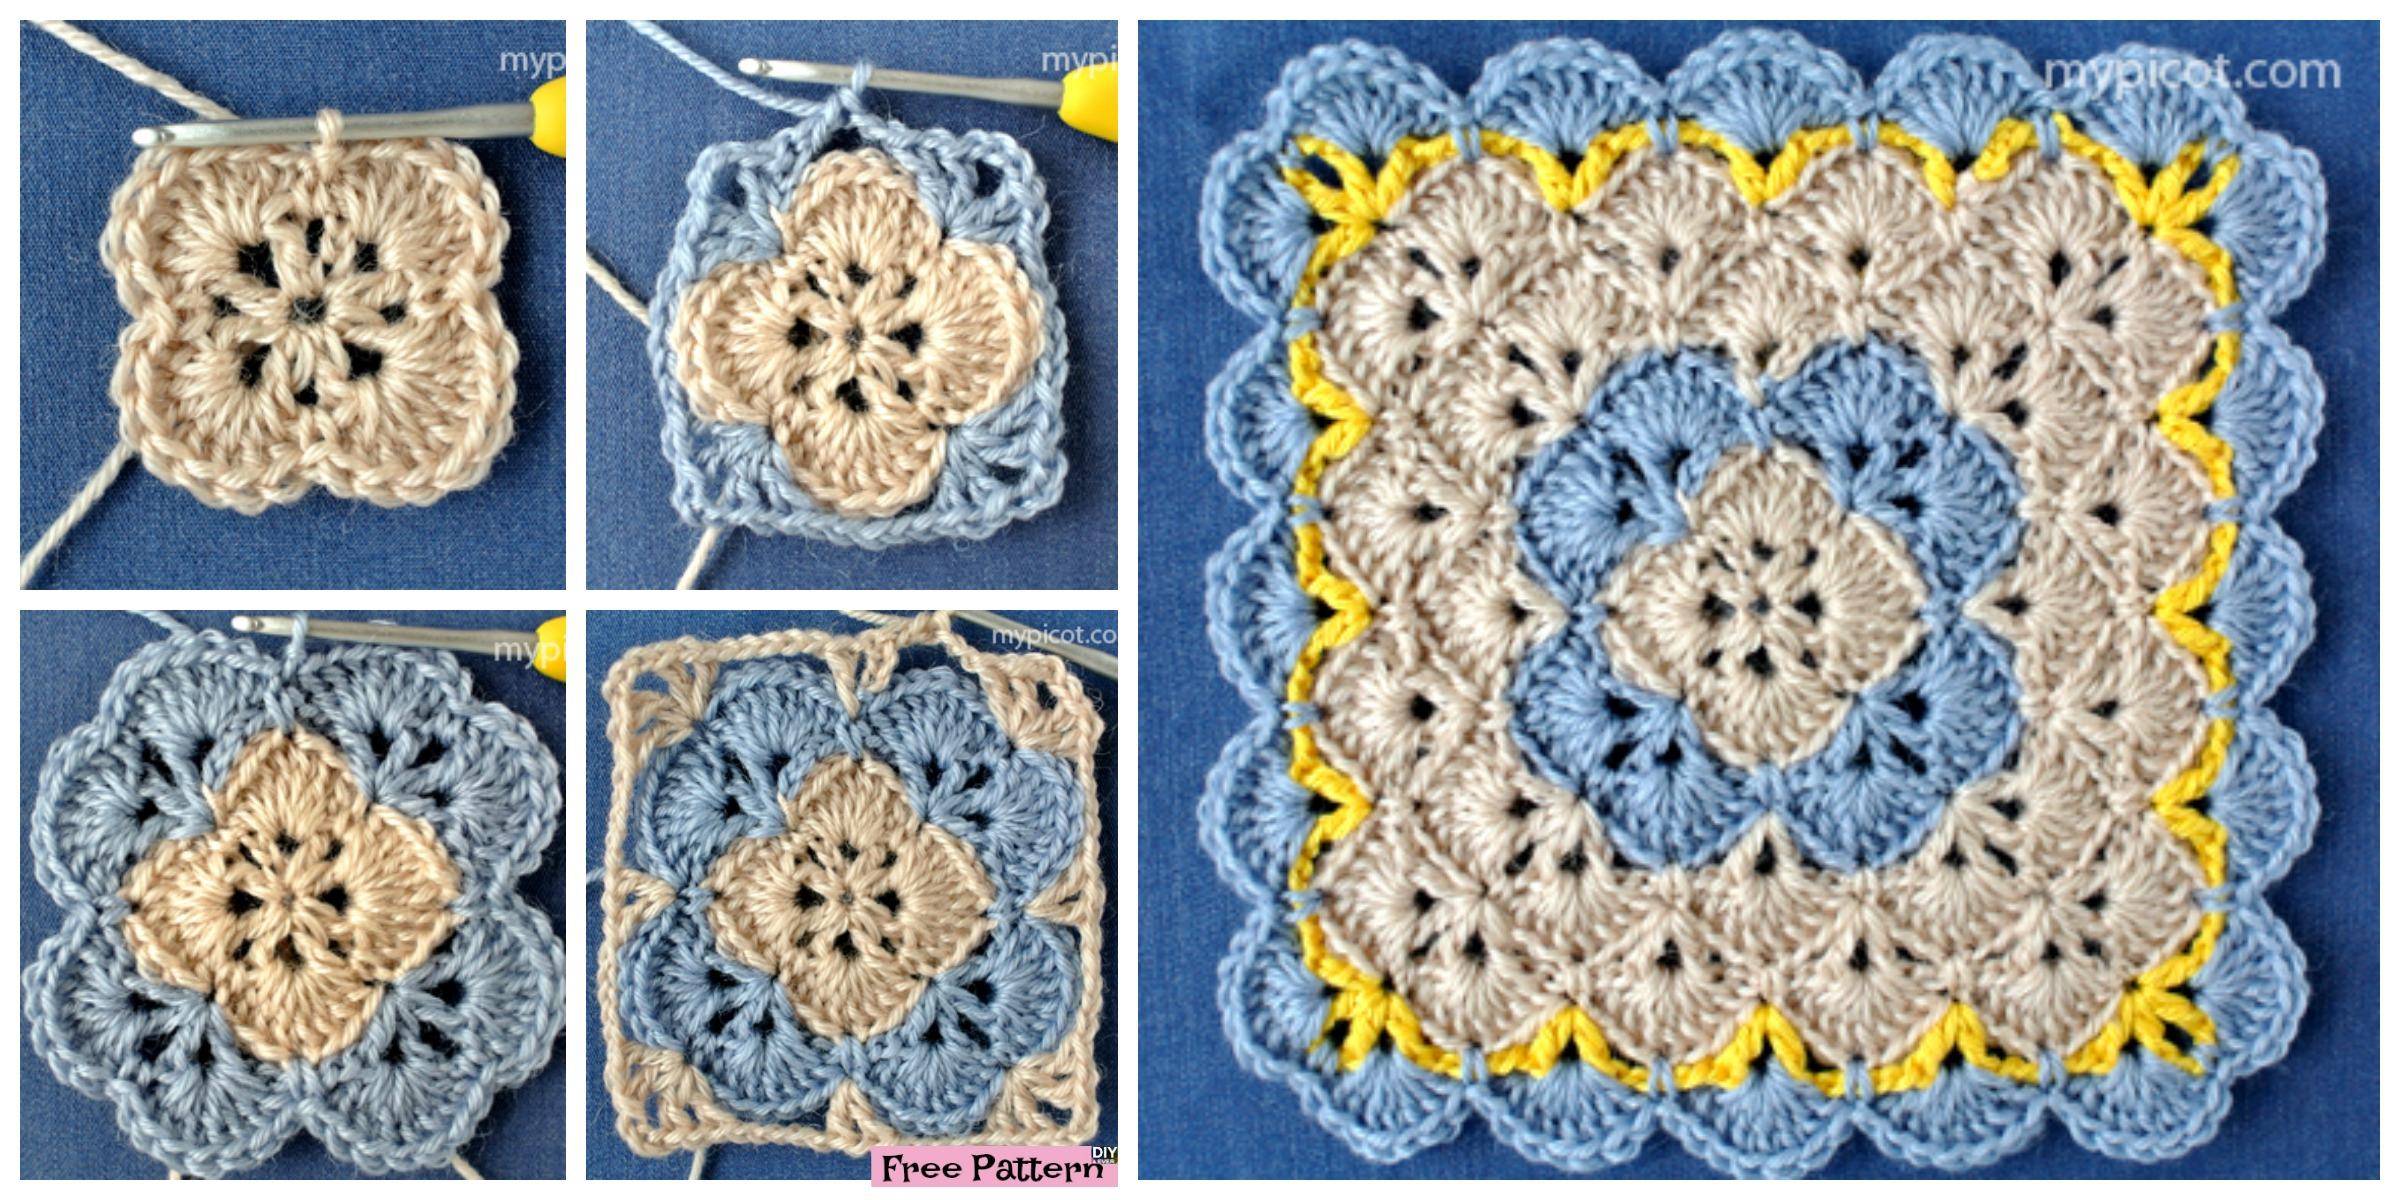 Crochet Shell Square Blanket – Free Pattern